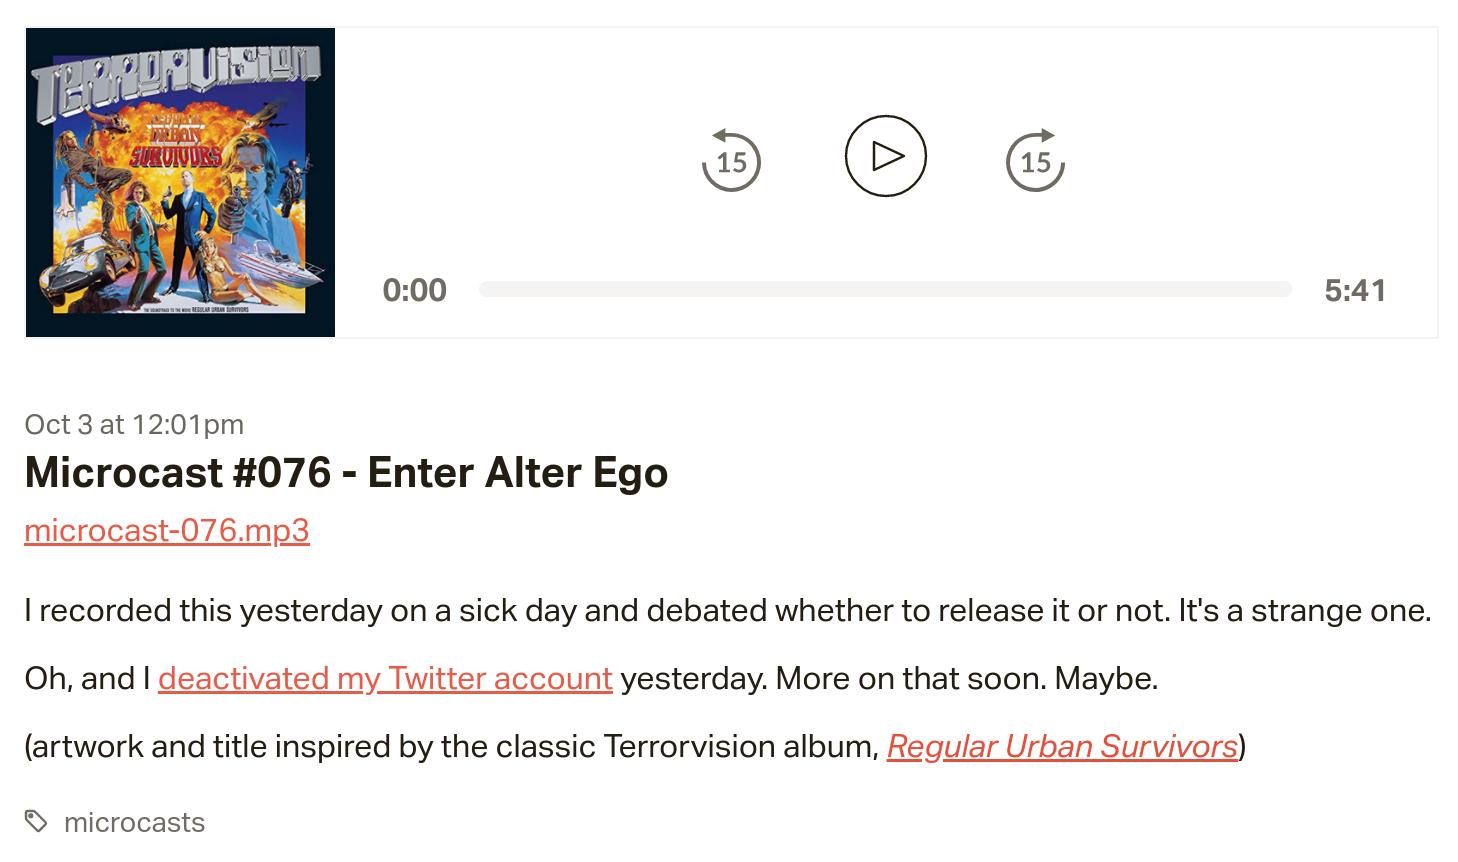 Microcast #076 - Enter Alter Ego